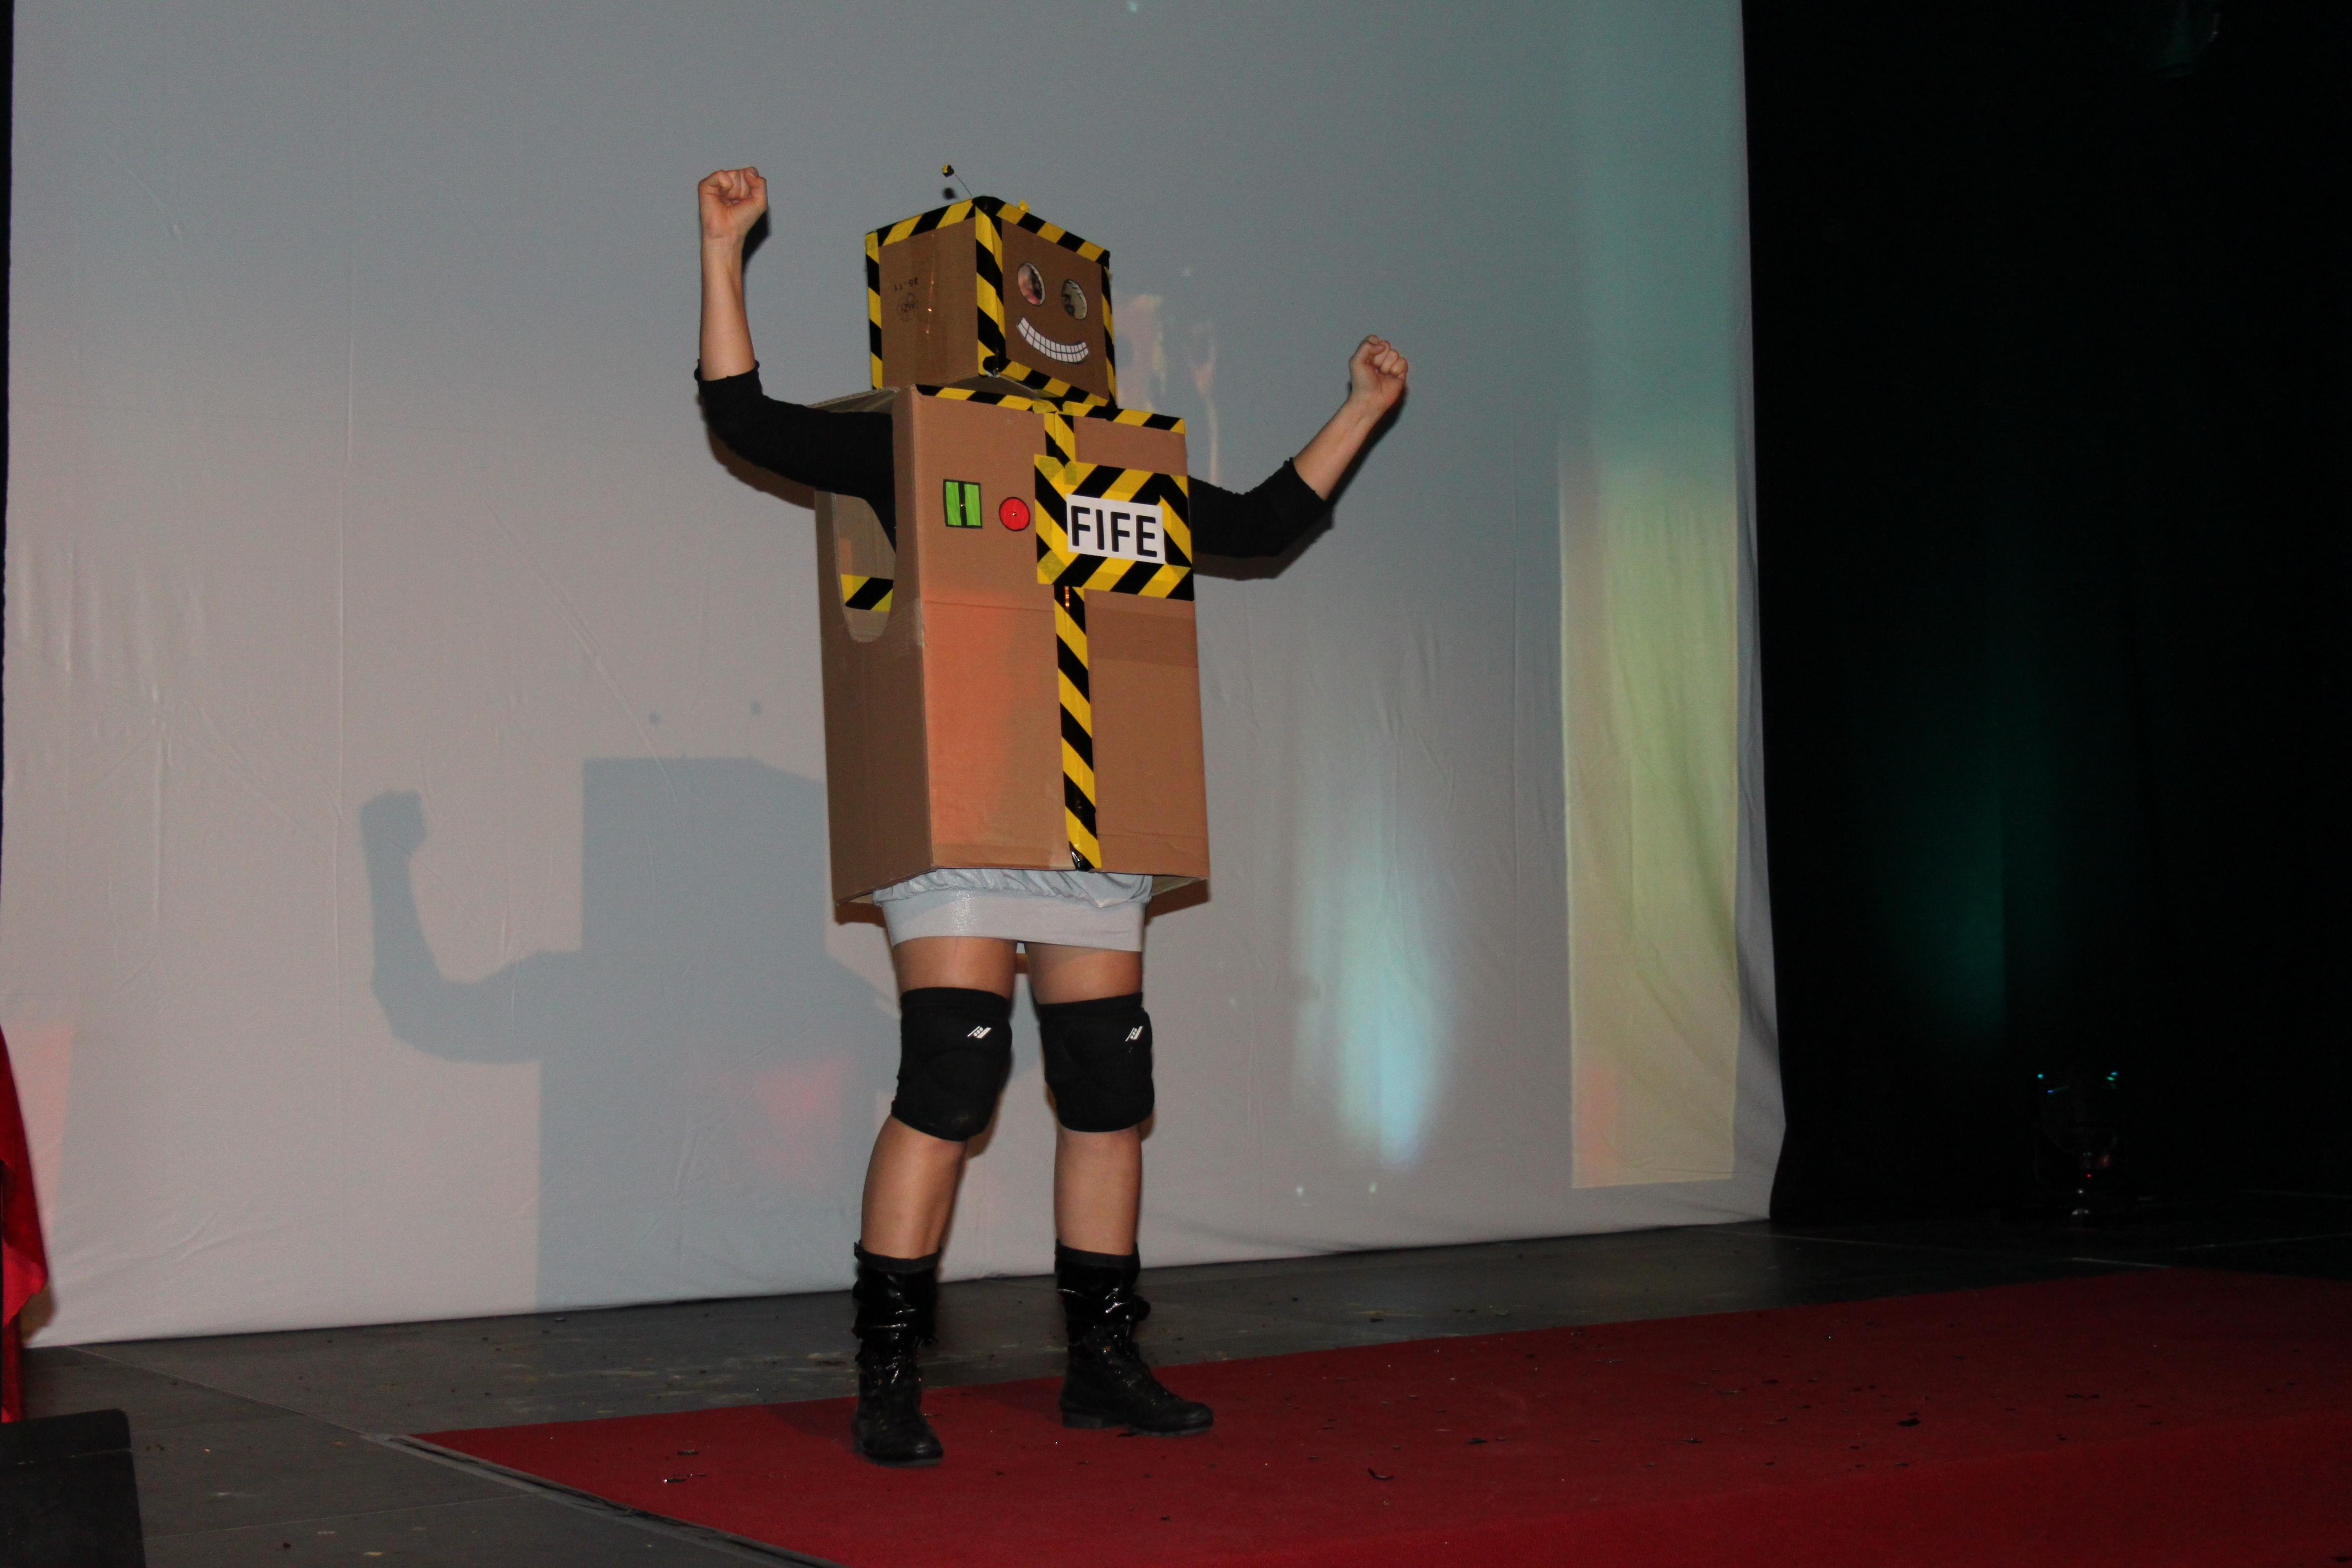 7. MiKiFiFe 2011: Impressionen (5)